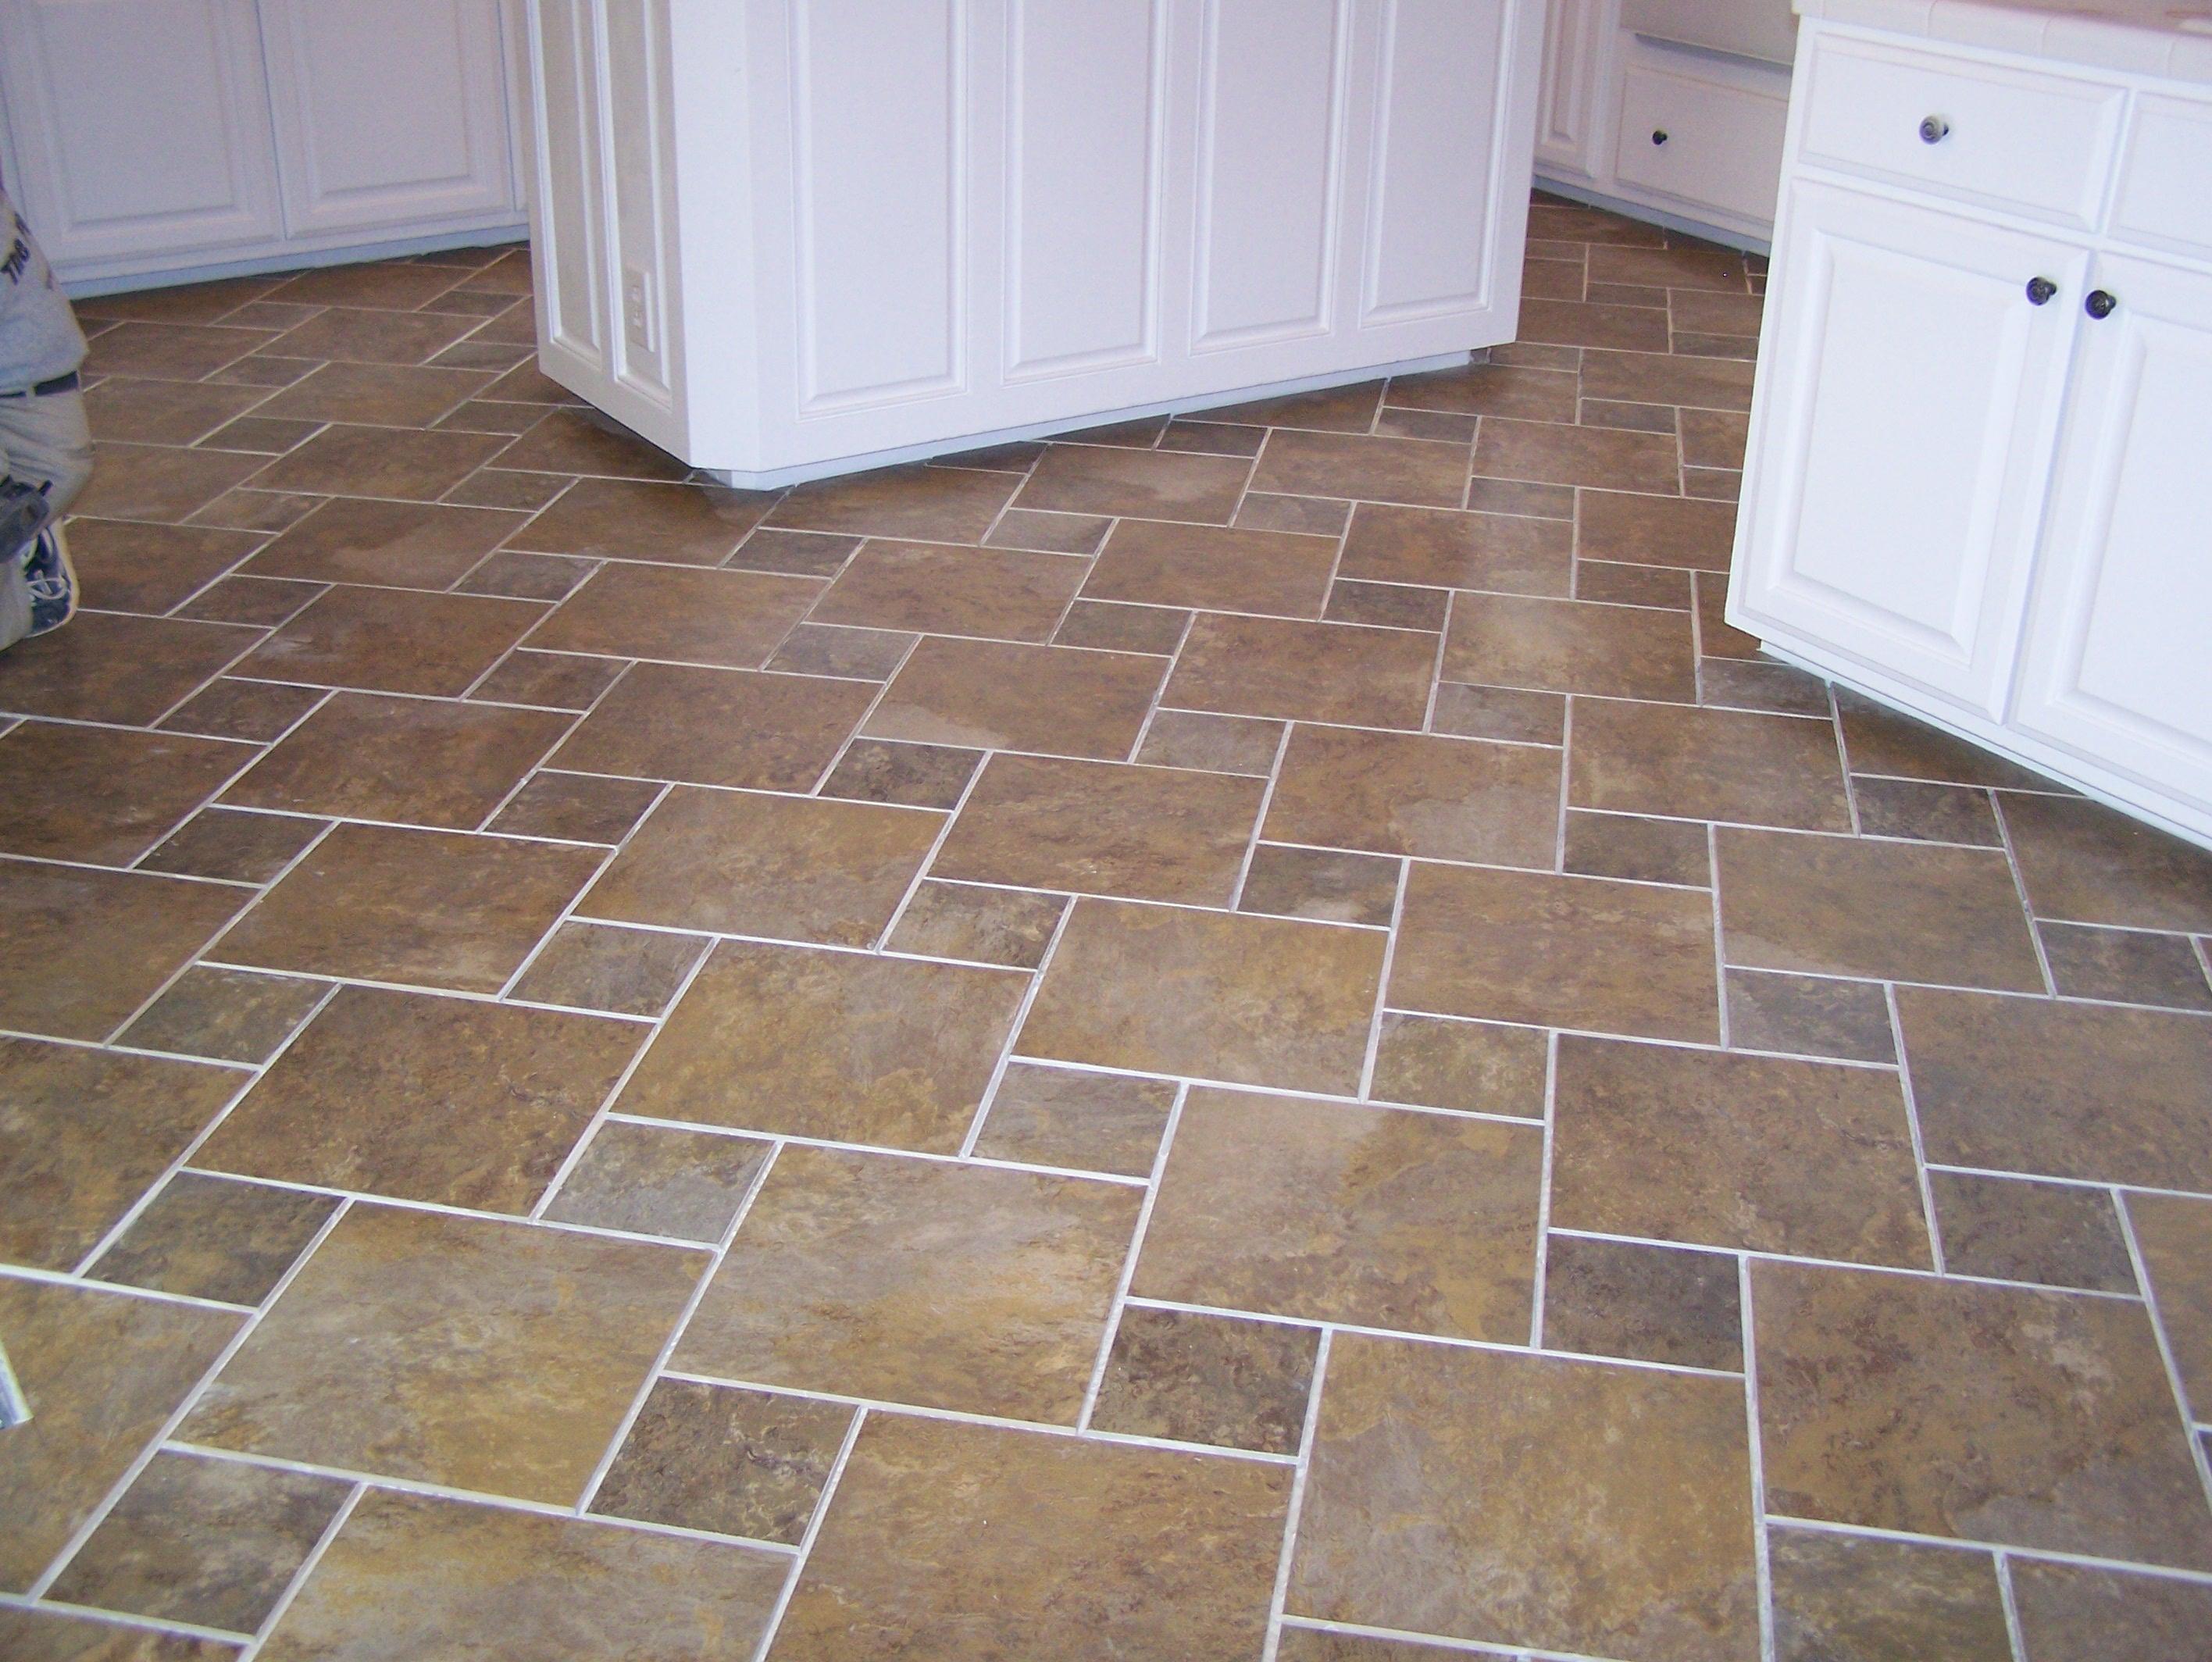 tile flooring designs kitchen floor tile designs Floor Tiles Design Ideas Additionally Kitchen